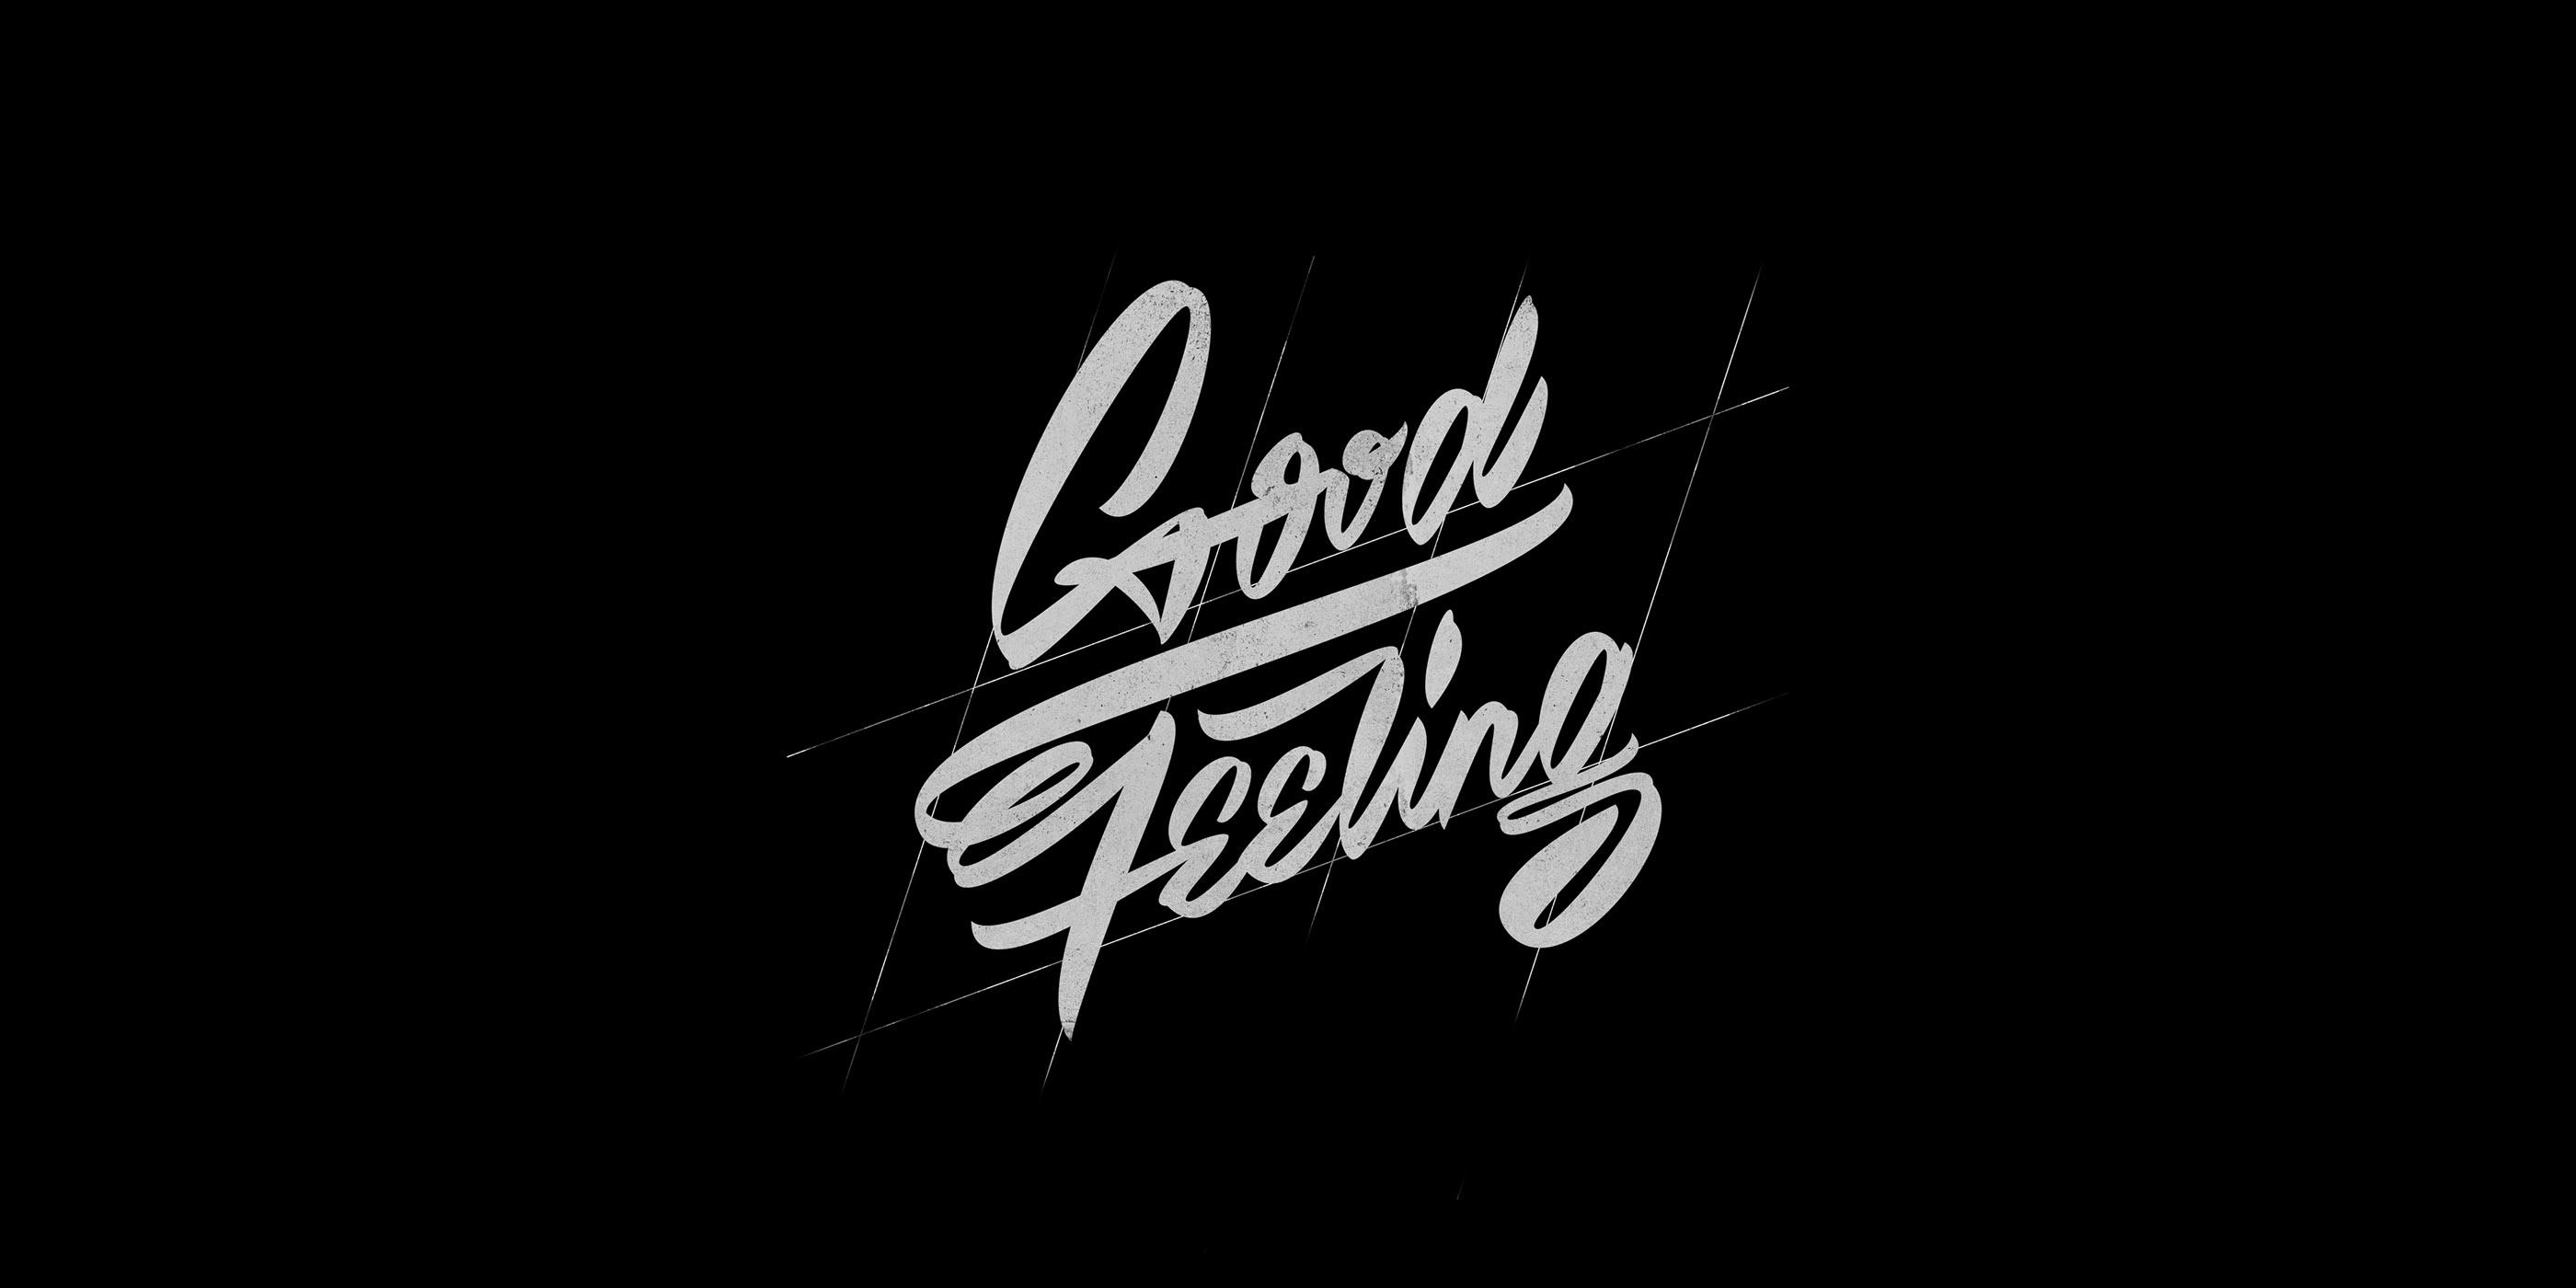 Plentiful Lettering Goodness by Naniii